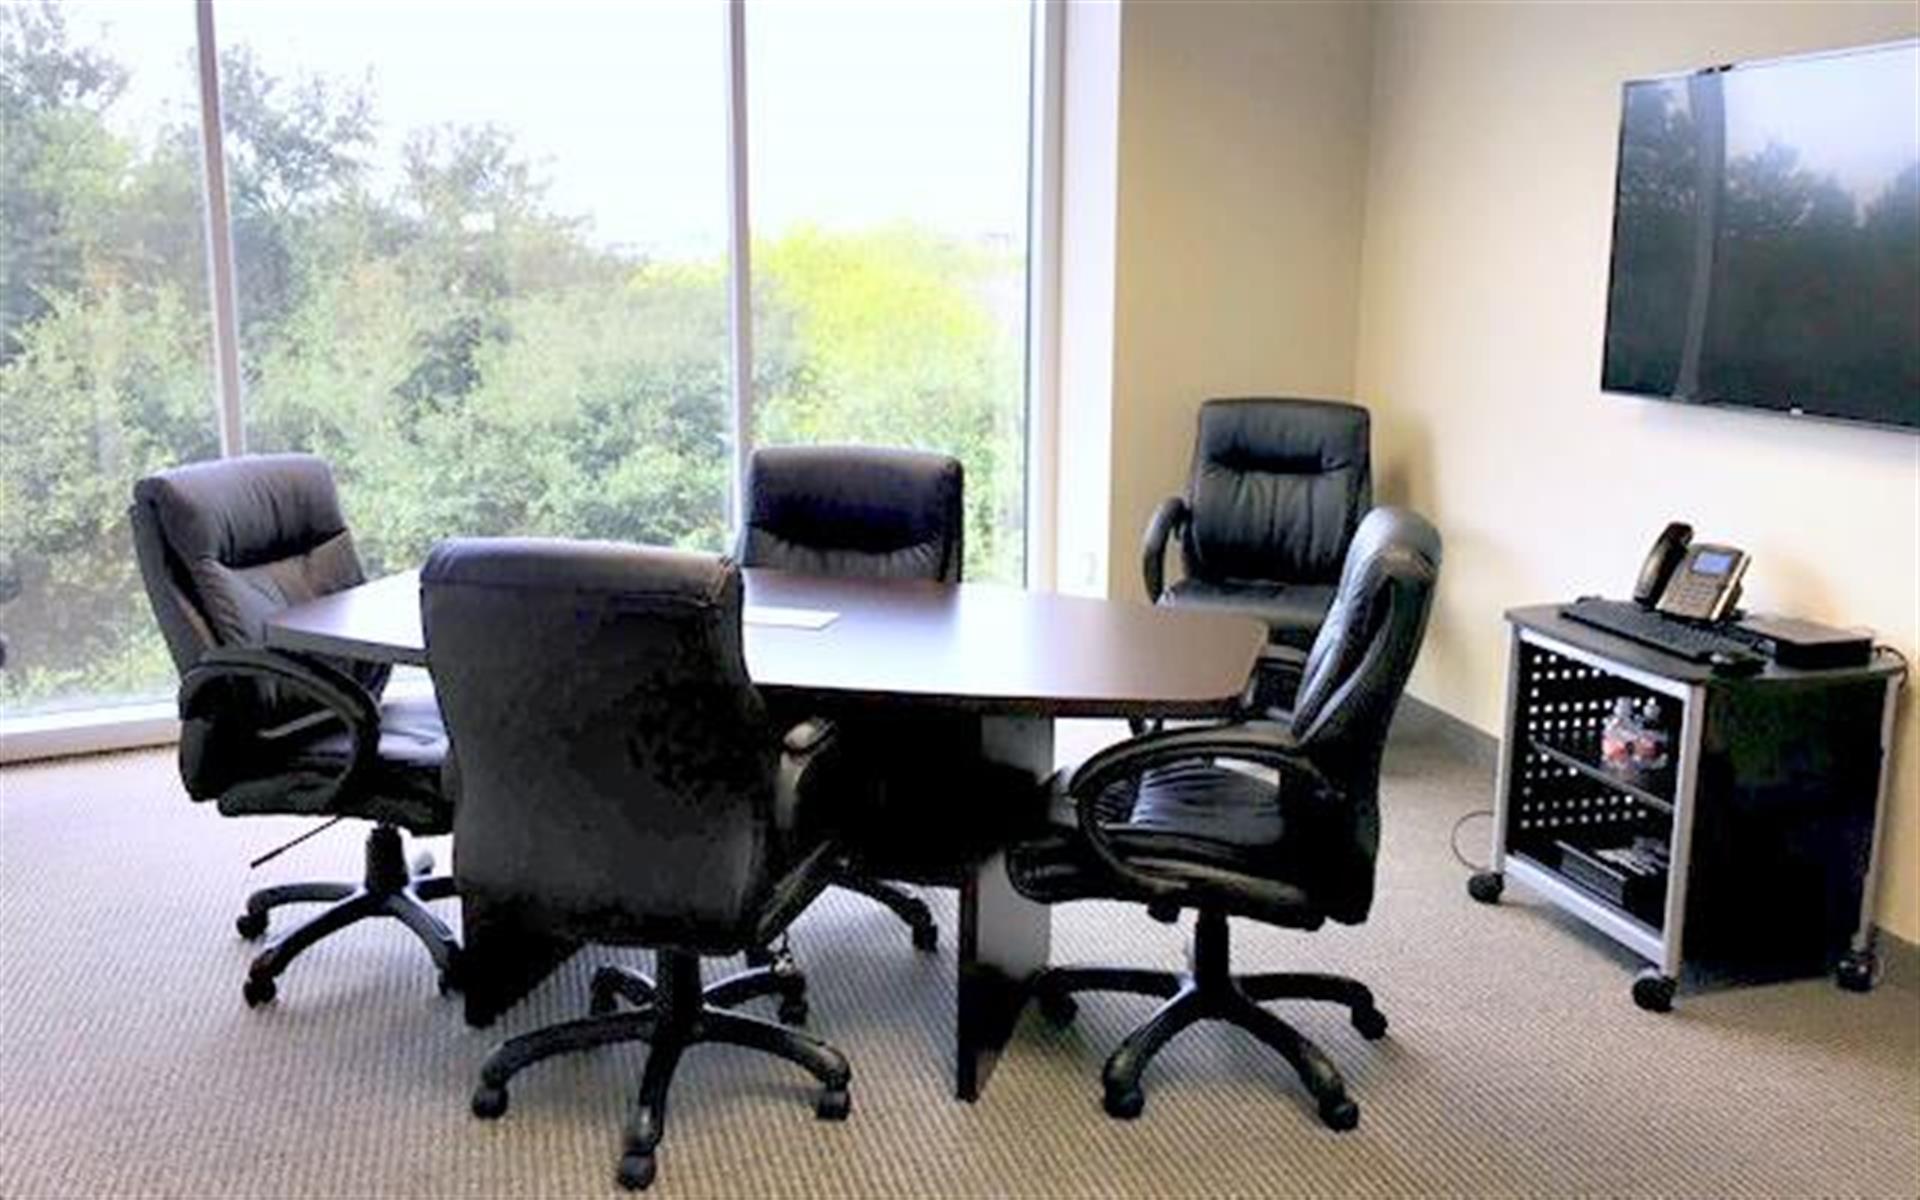 CUBExec - Interchange Building Executive Suites - Small Conference Room